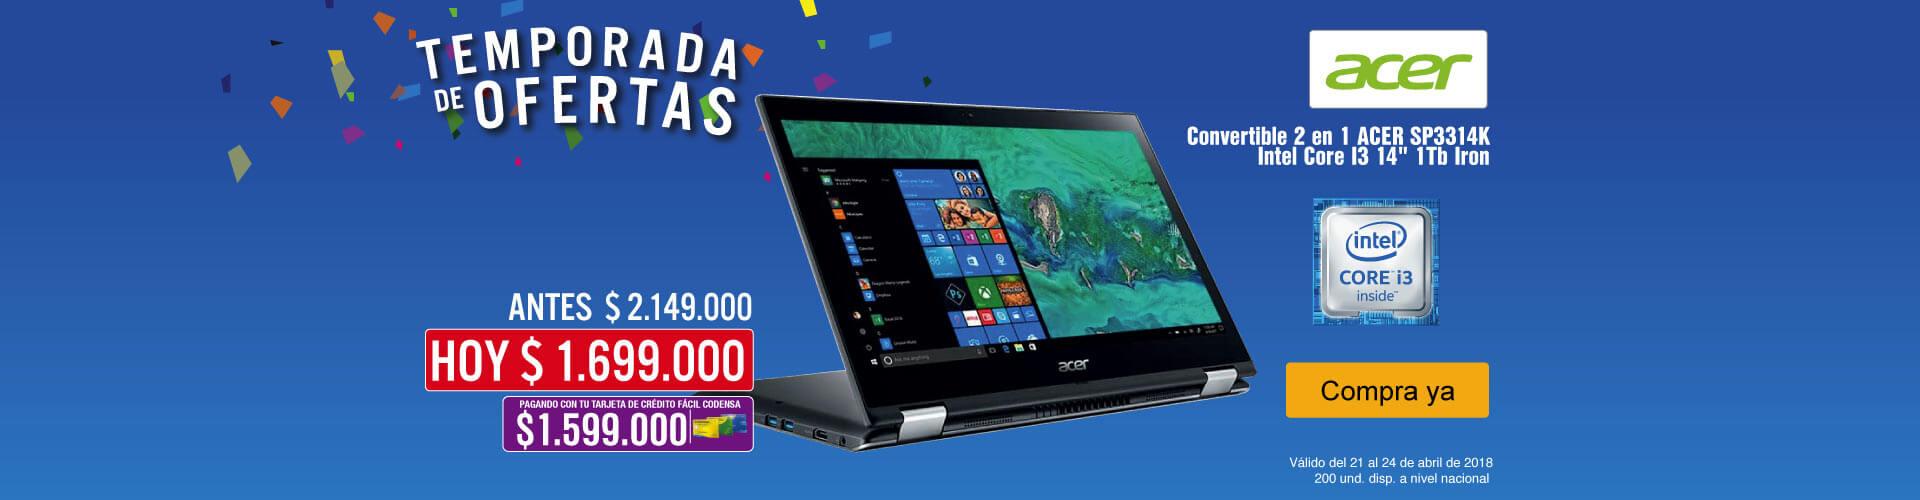 KT-PPAL-3-computadores y tablets-PP---Acer-SP3314K-Abr21